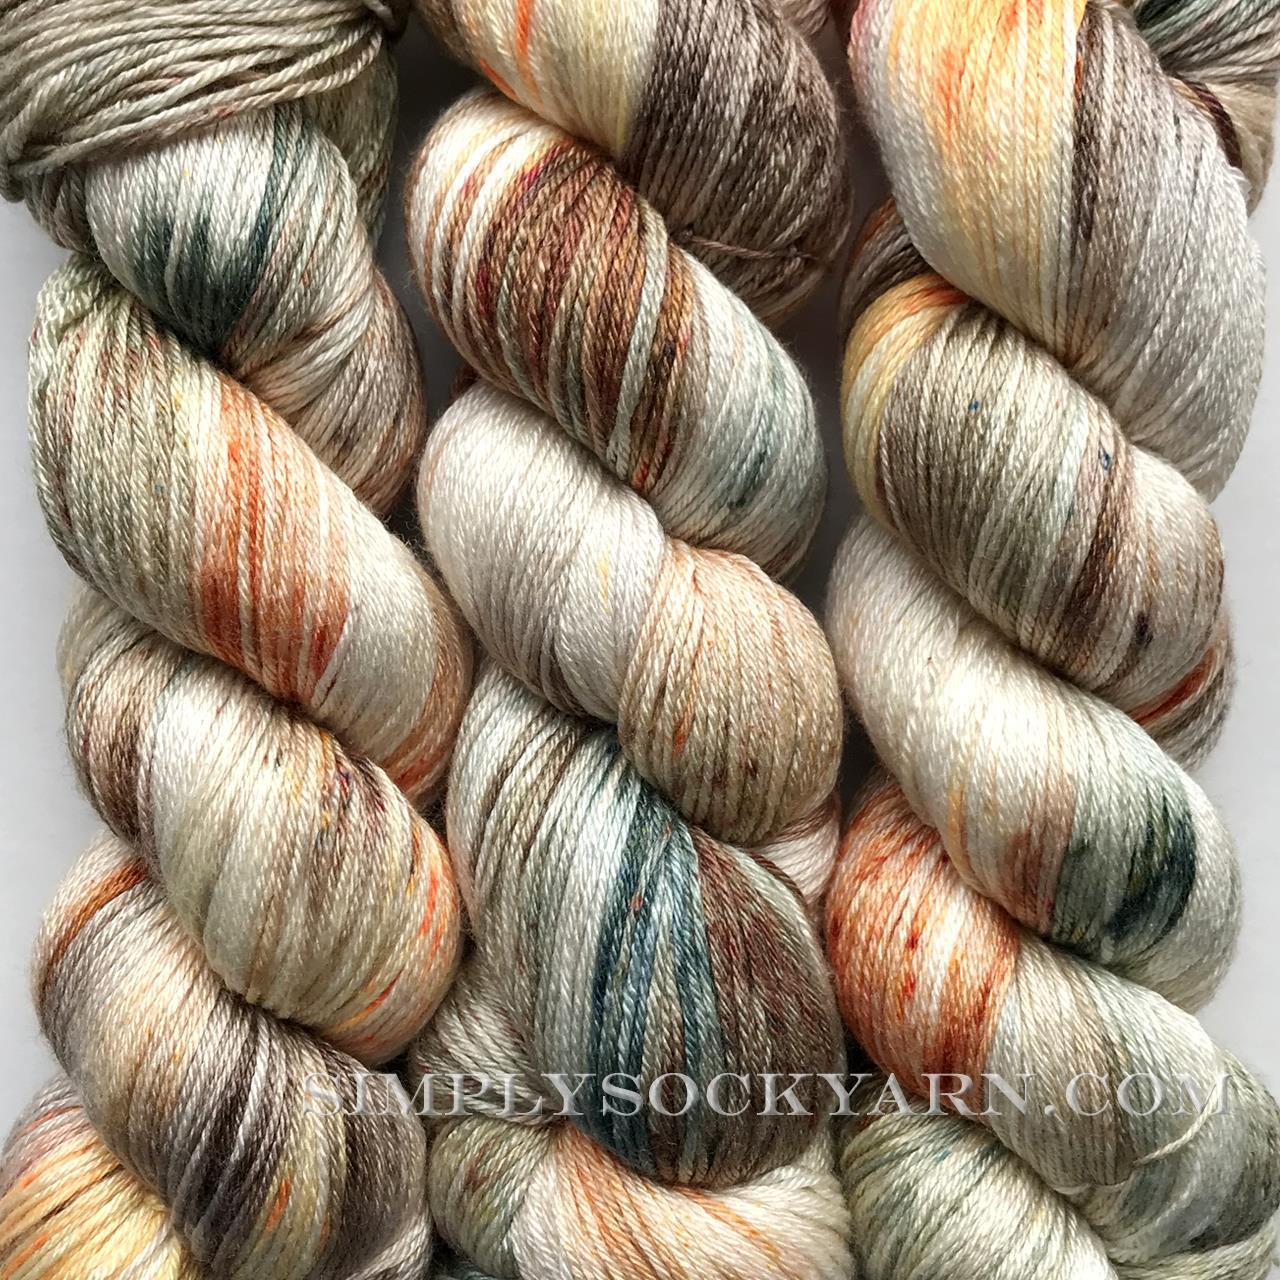 LITLG Silk Dragon Seed -